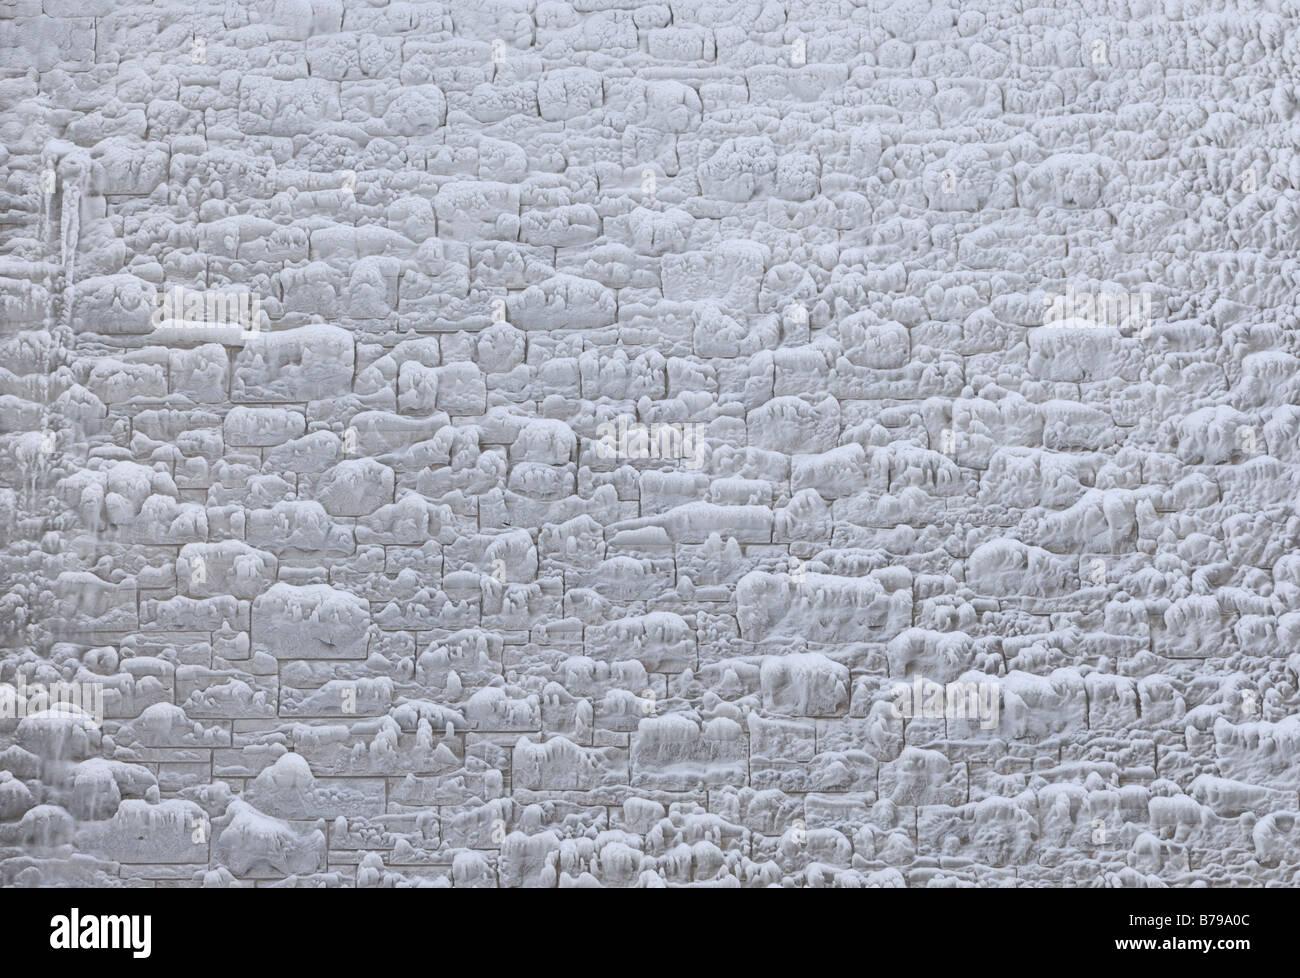 Frozen stone wall - Stock Image